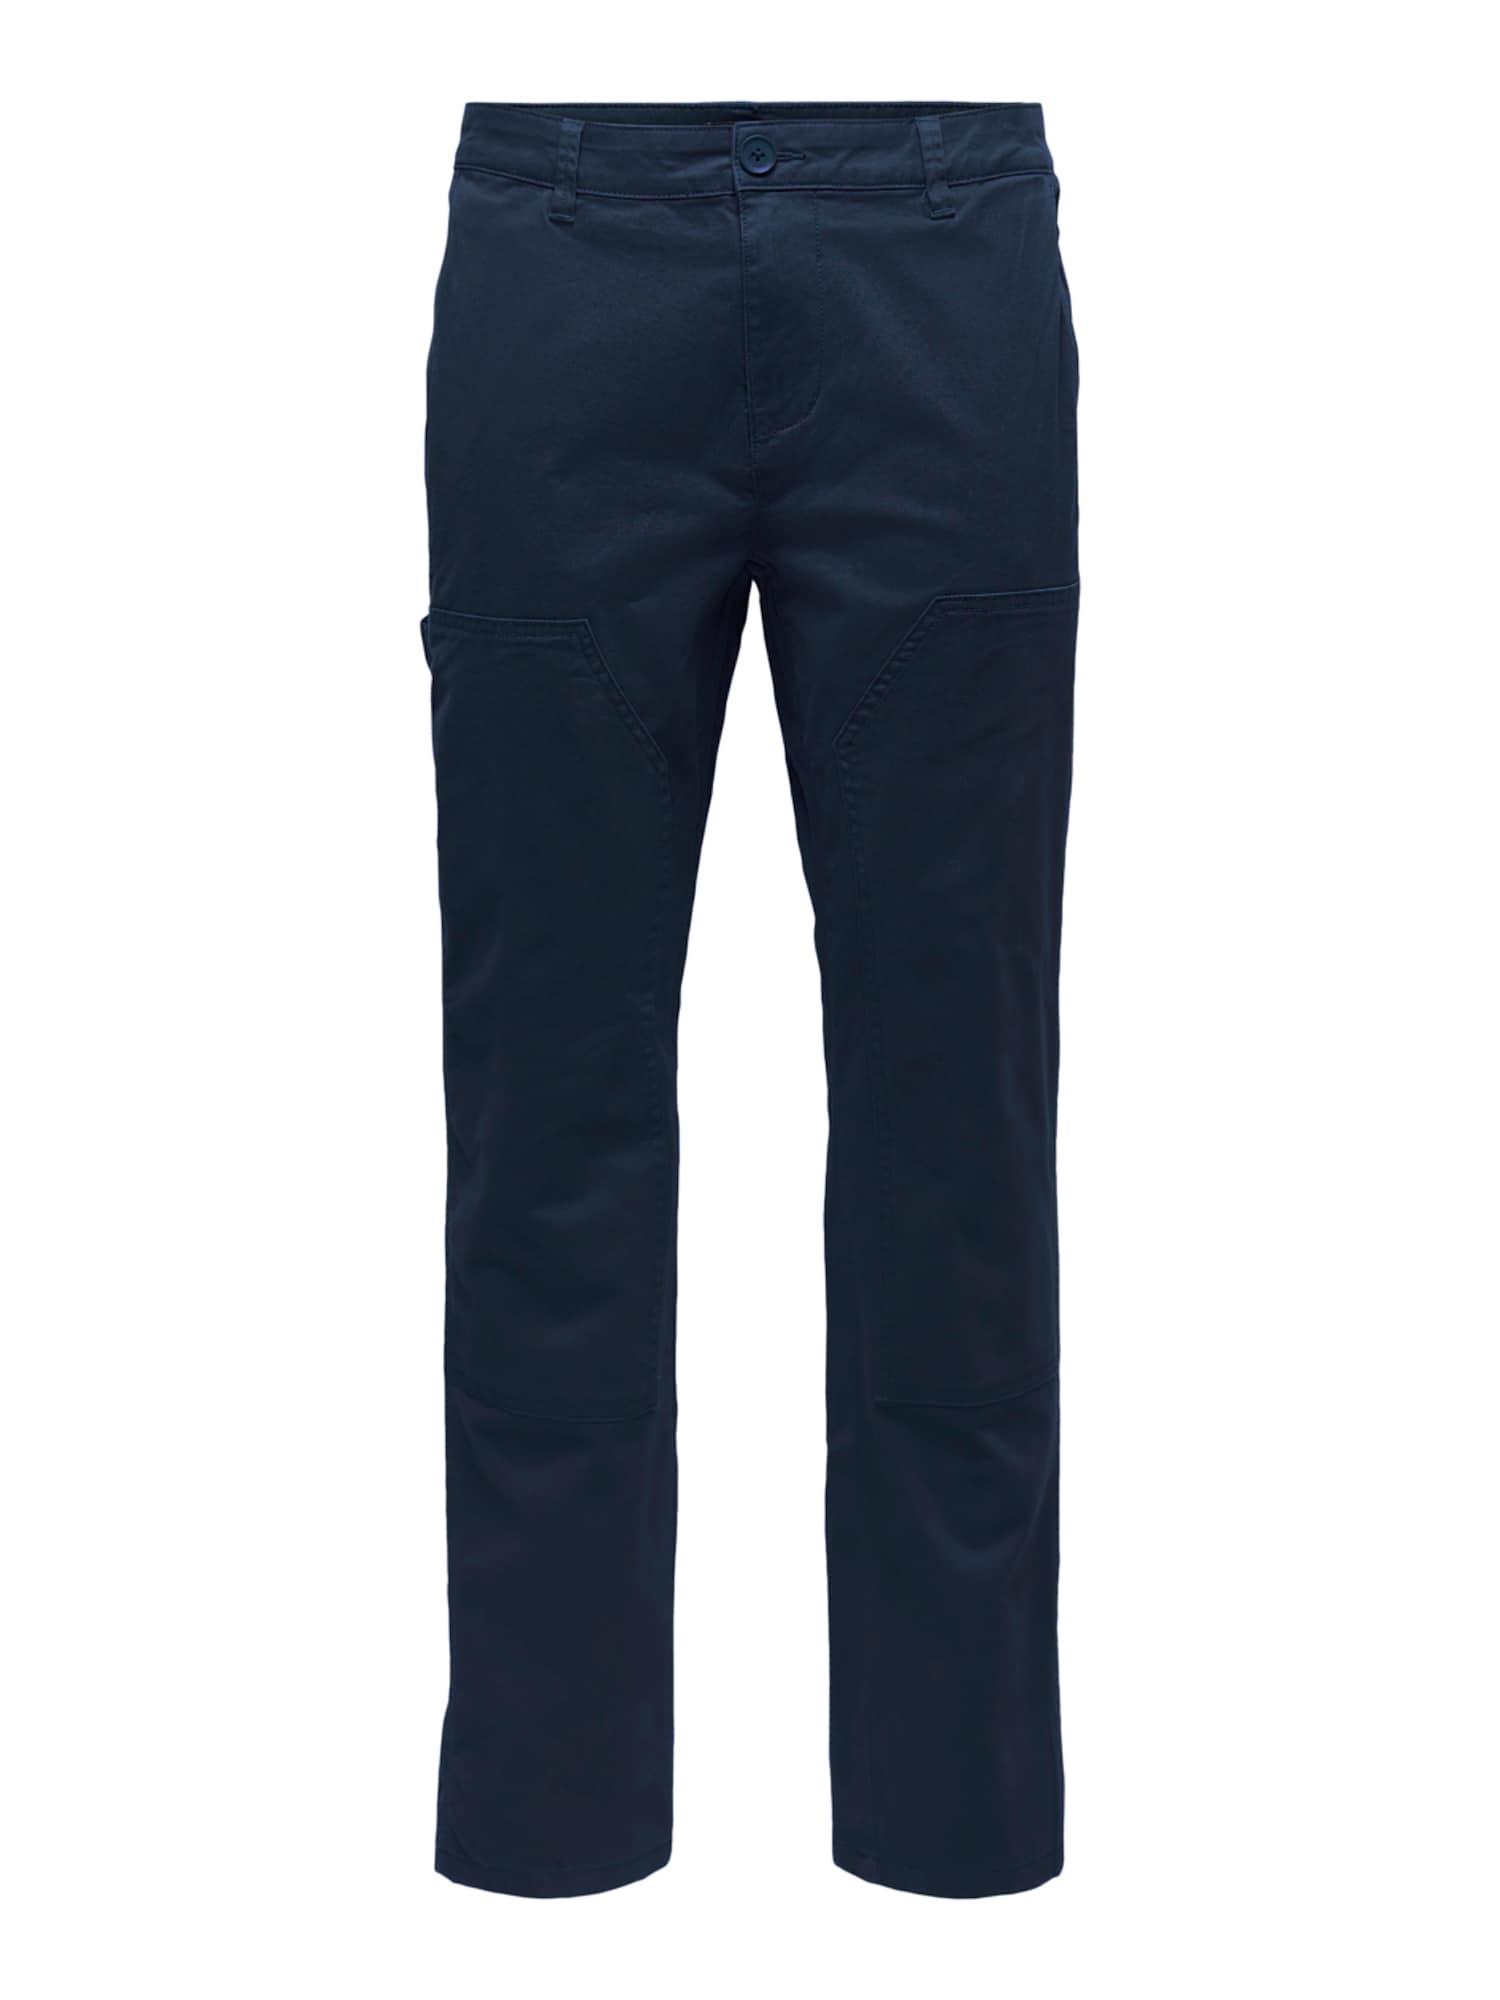 Only & Sons Pantalon 'Cam'  - Bleu - Taille: 31 - male